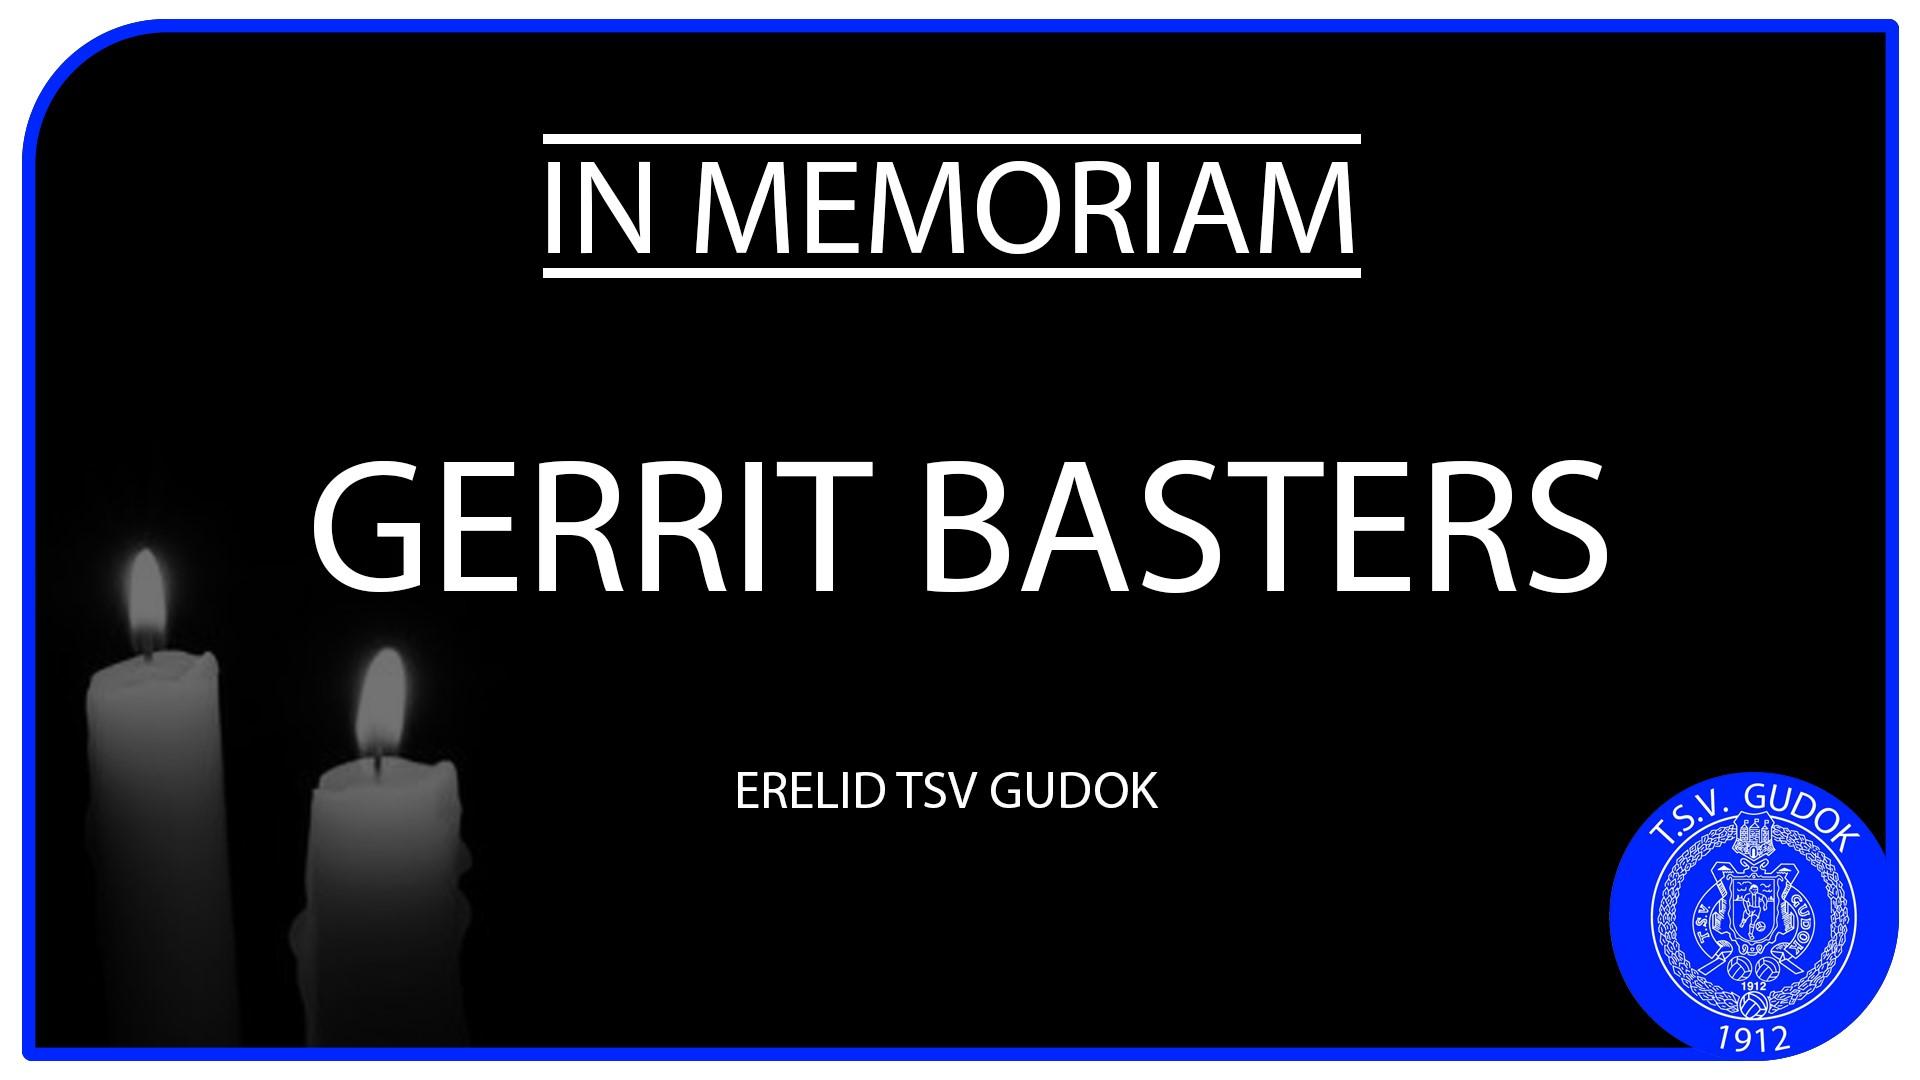 IN MEMORIAM: ERELID GERRIT BASTERS